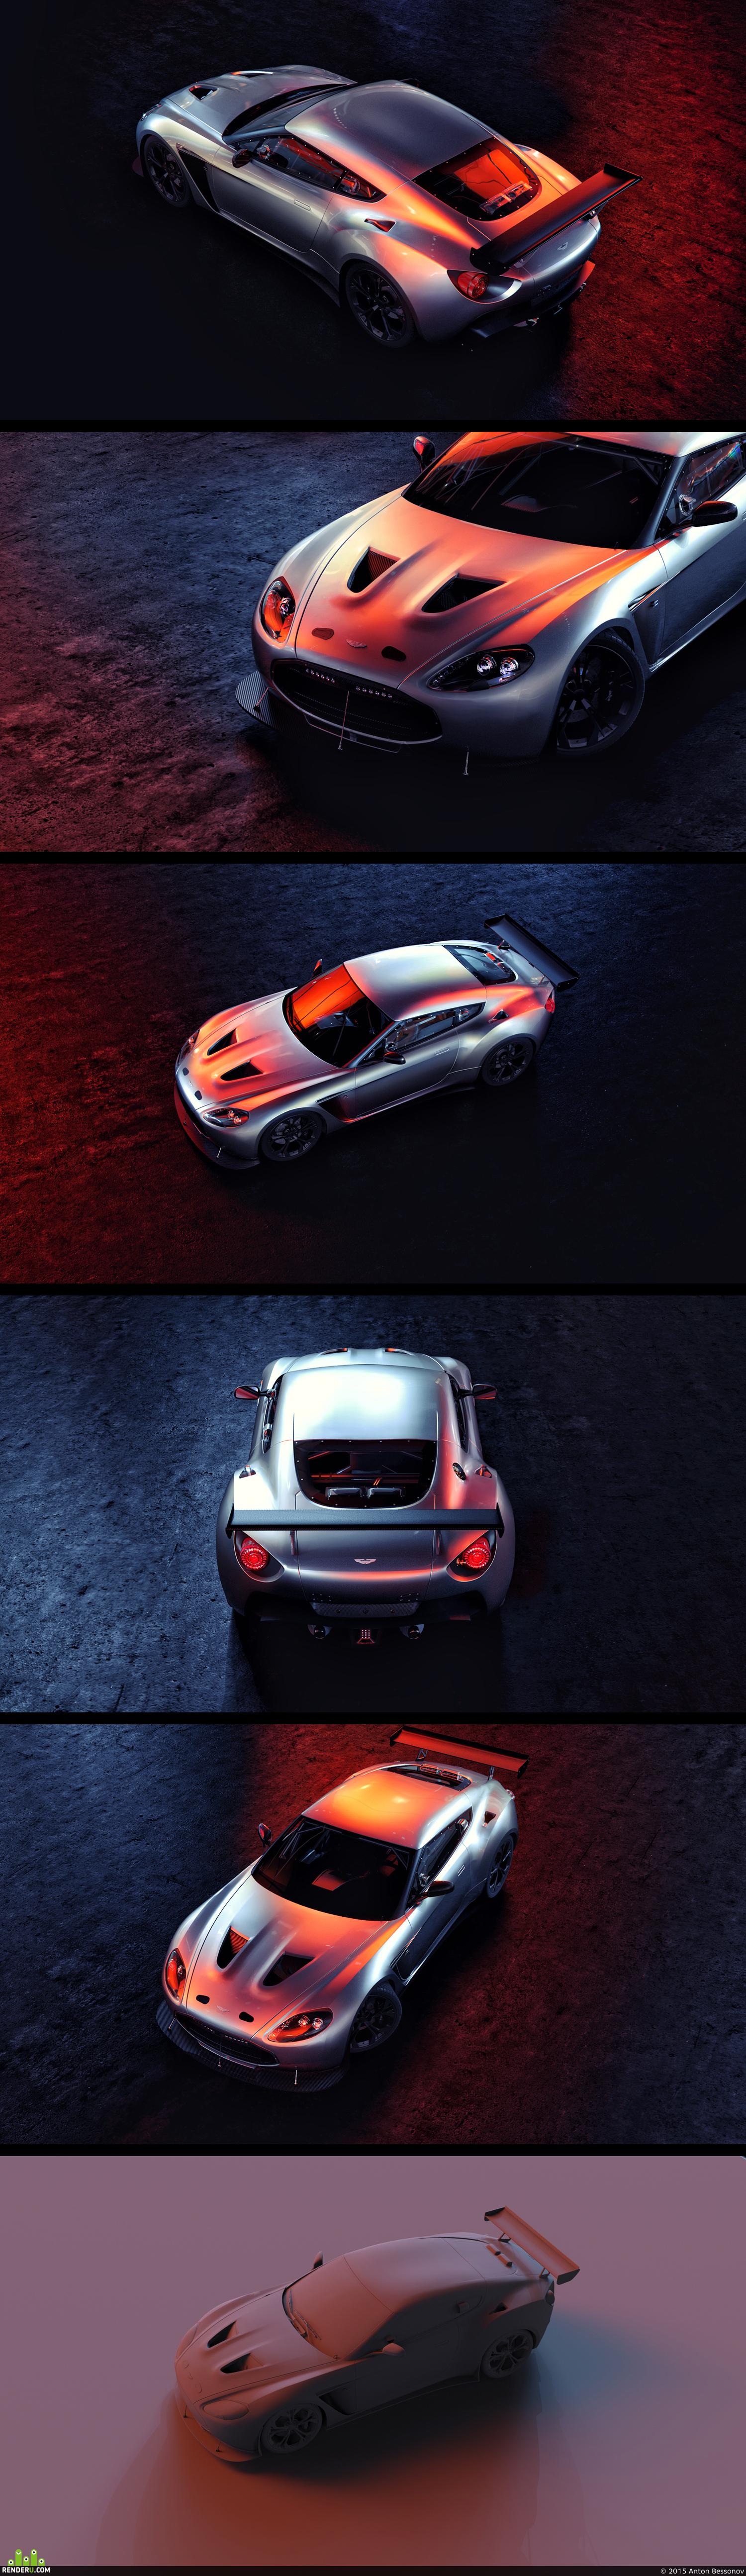 preview Aston Martin Zagato